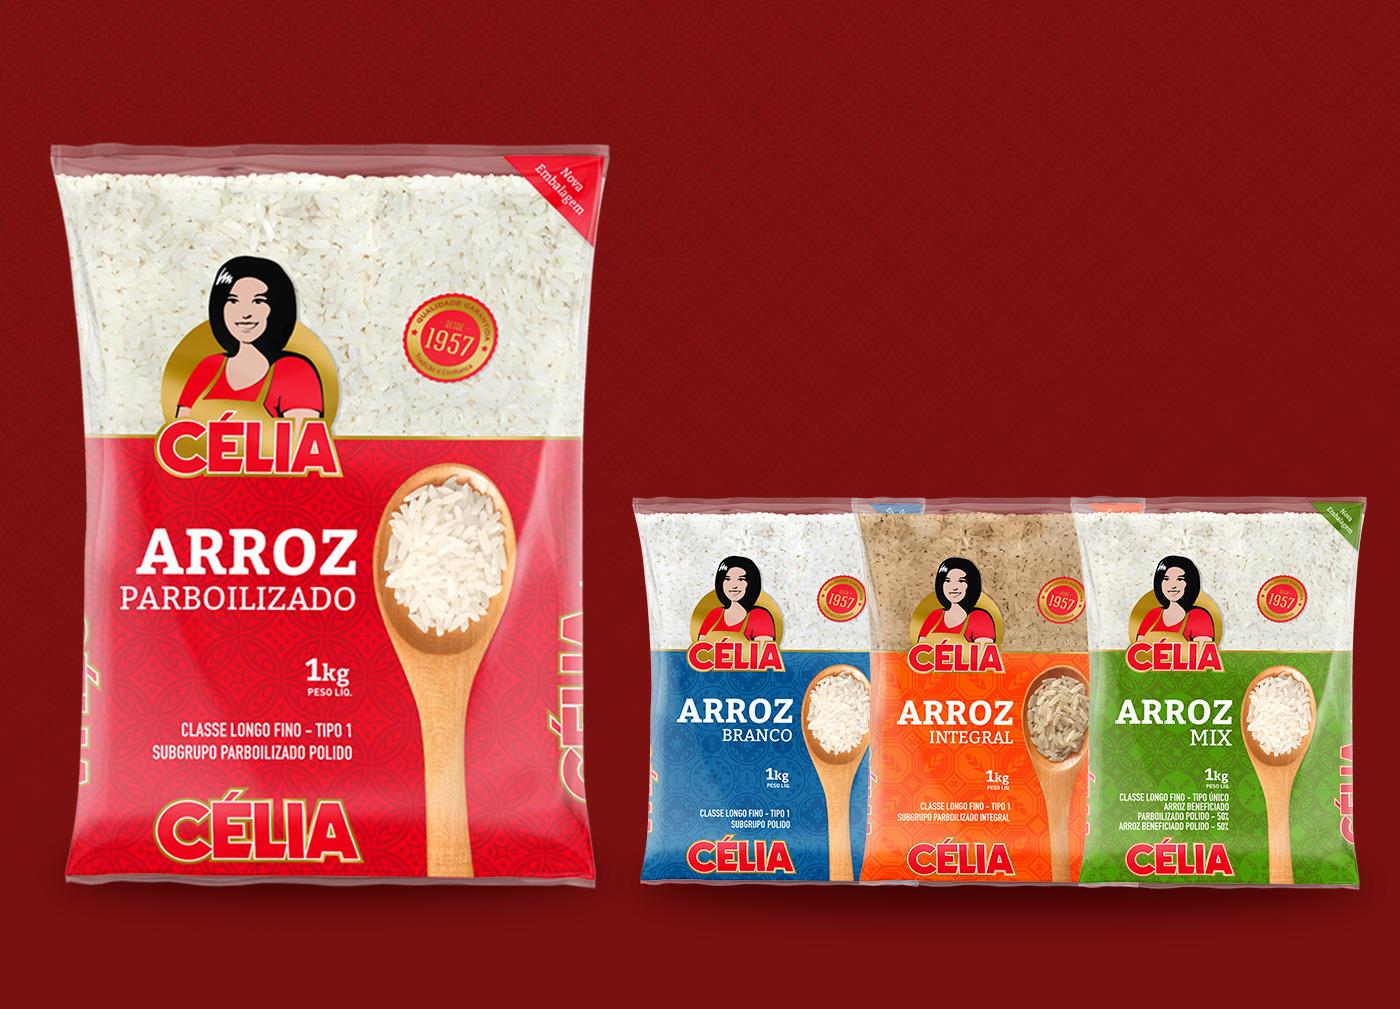 Design de embalagens arroz celia